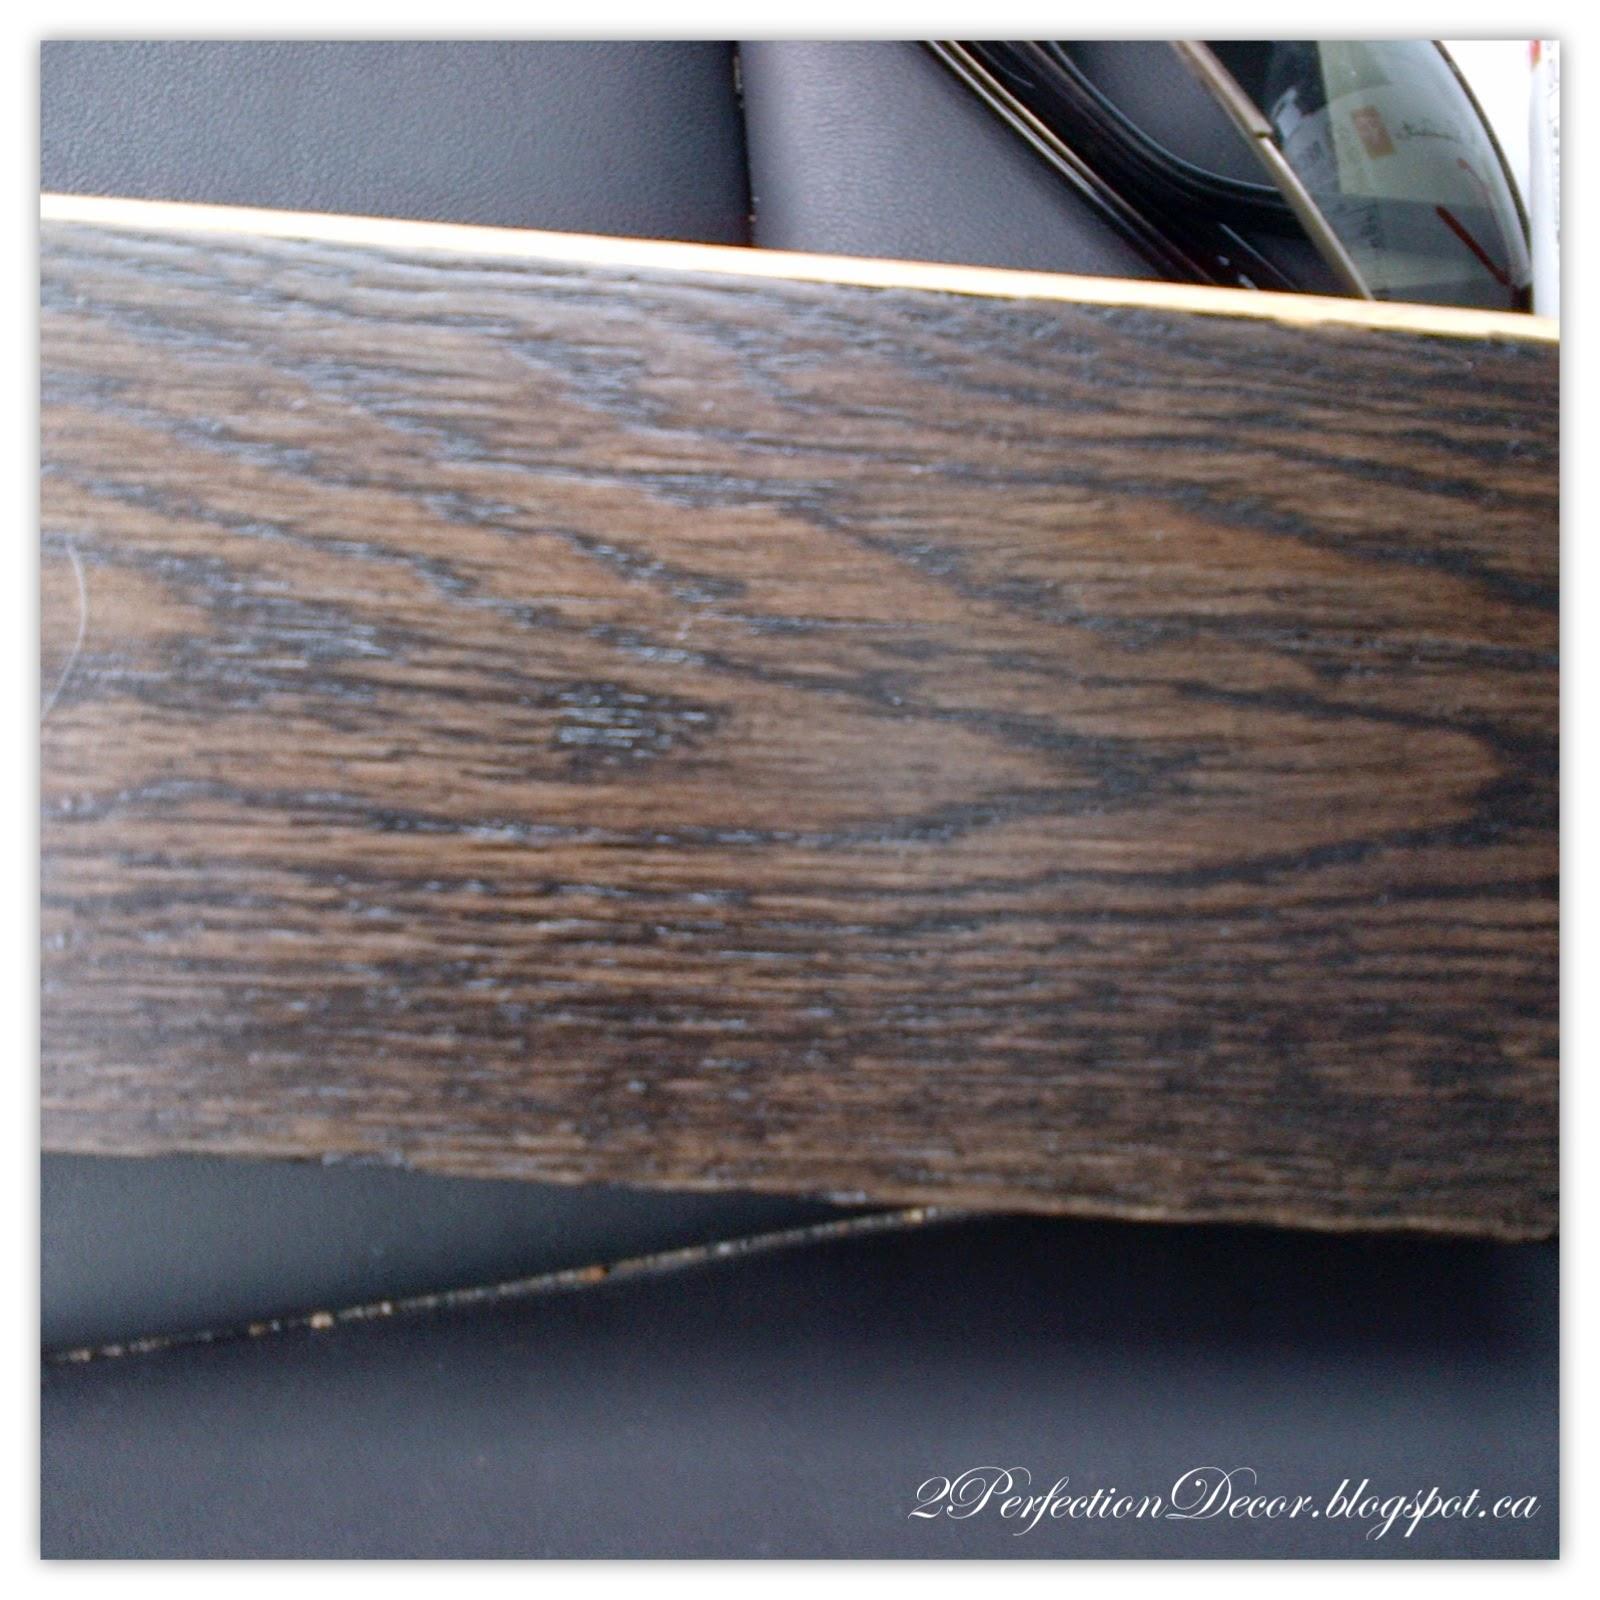 Dark Stained Oak Floors: 2Perfection Decor: Hazelnut Oak Floors Re-Finished To Dark